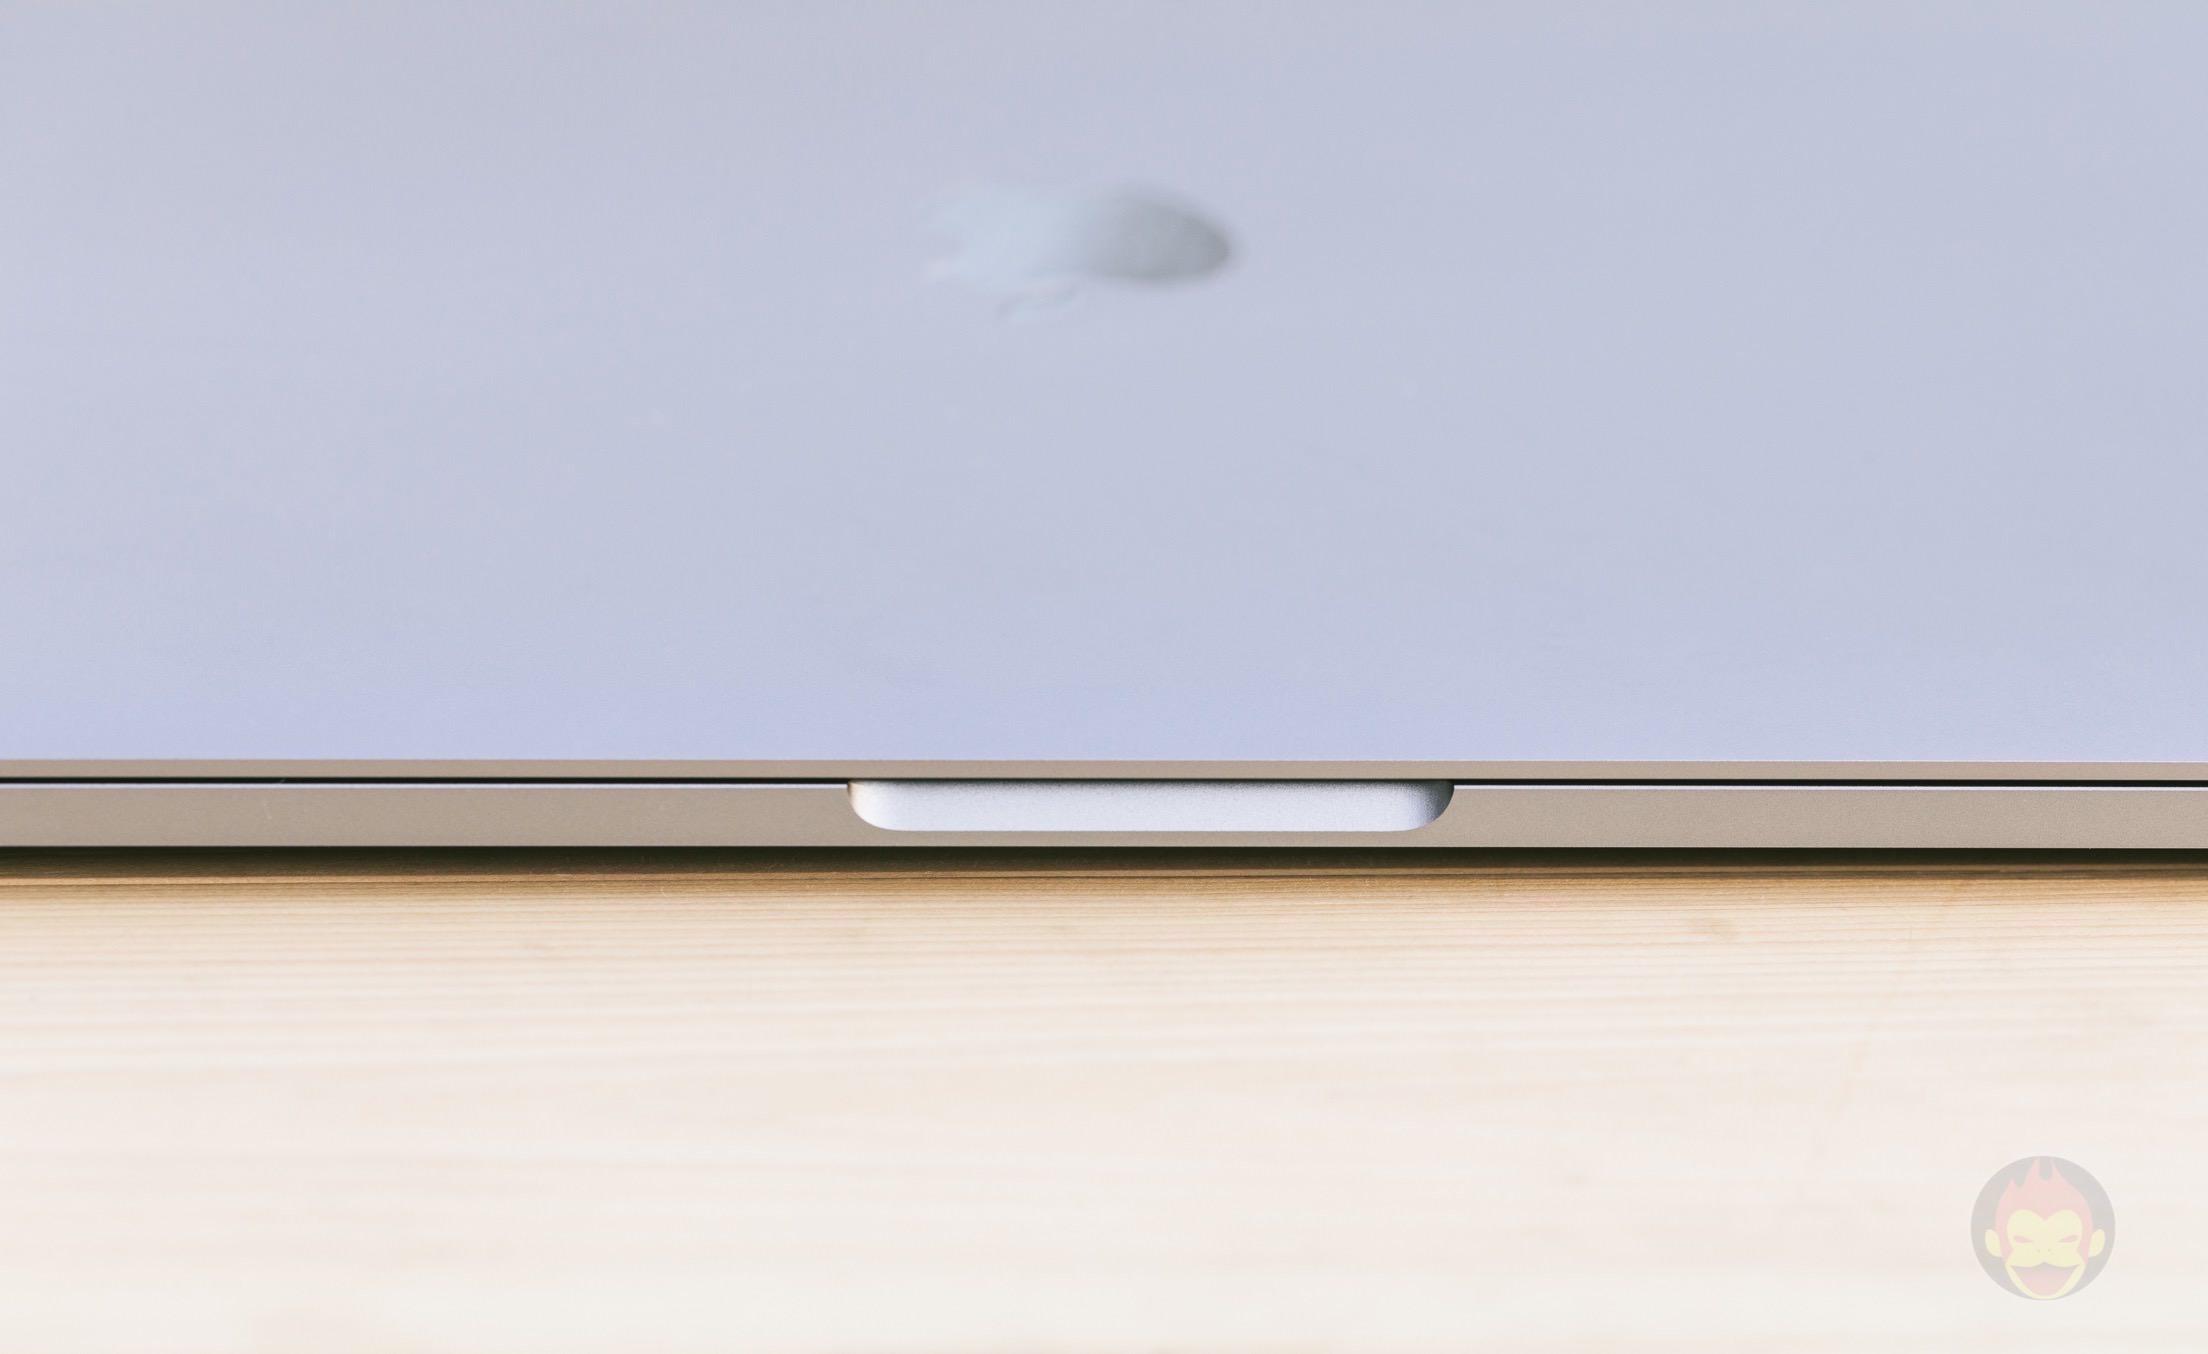 MacBook-Pro-Late2016-15inch-model-photos-08.jpg